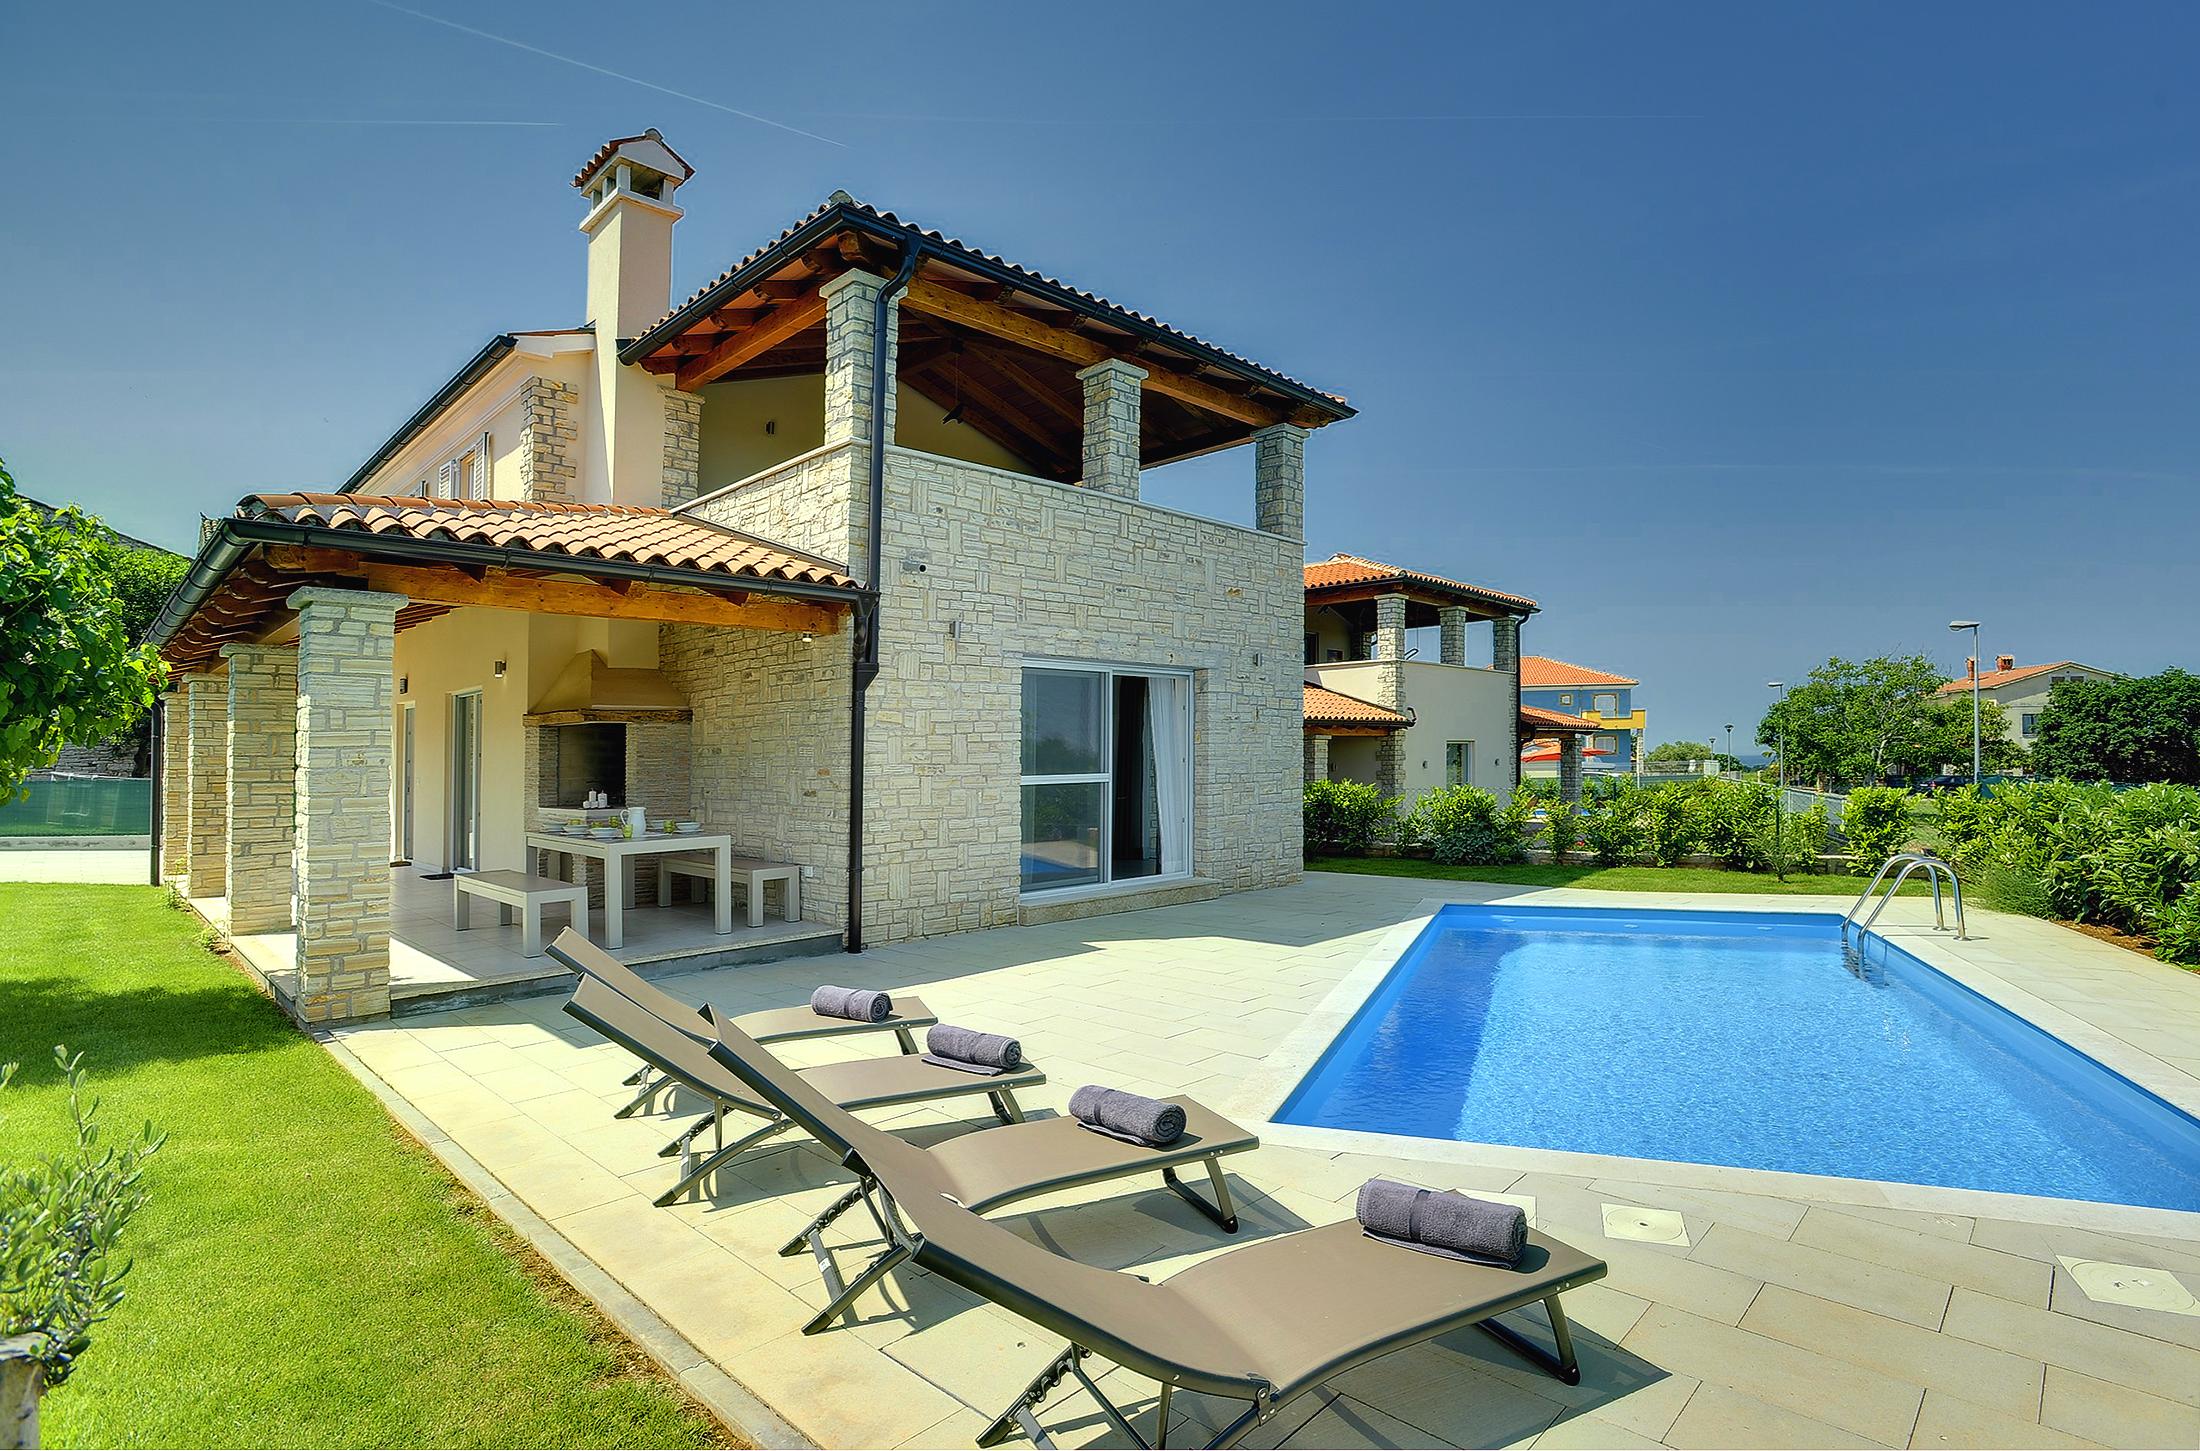 Prenotate questa moderna villa con piscina terrazza e barbecue